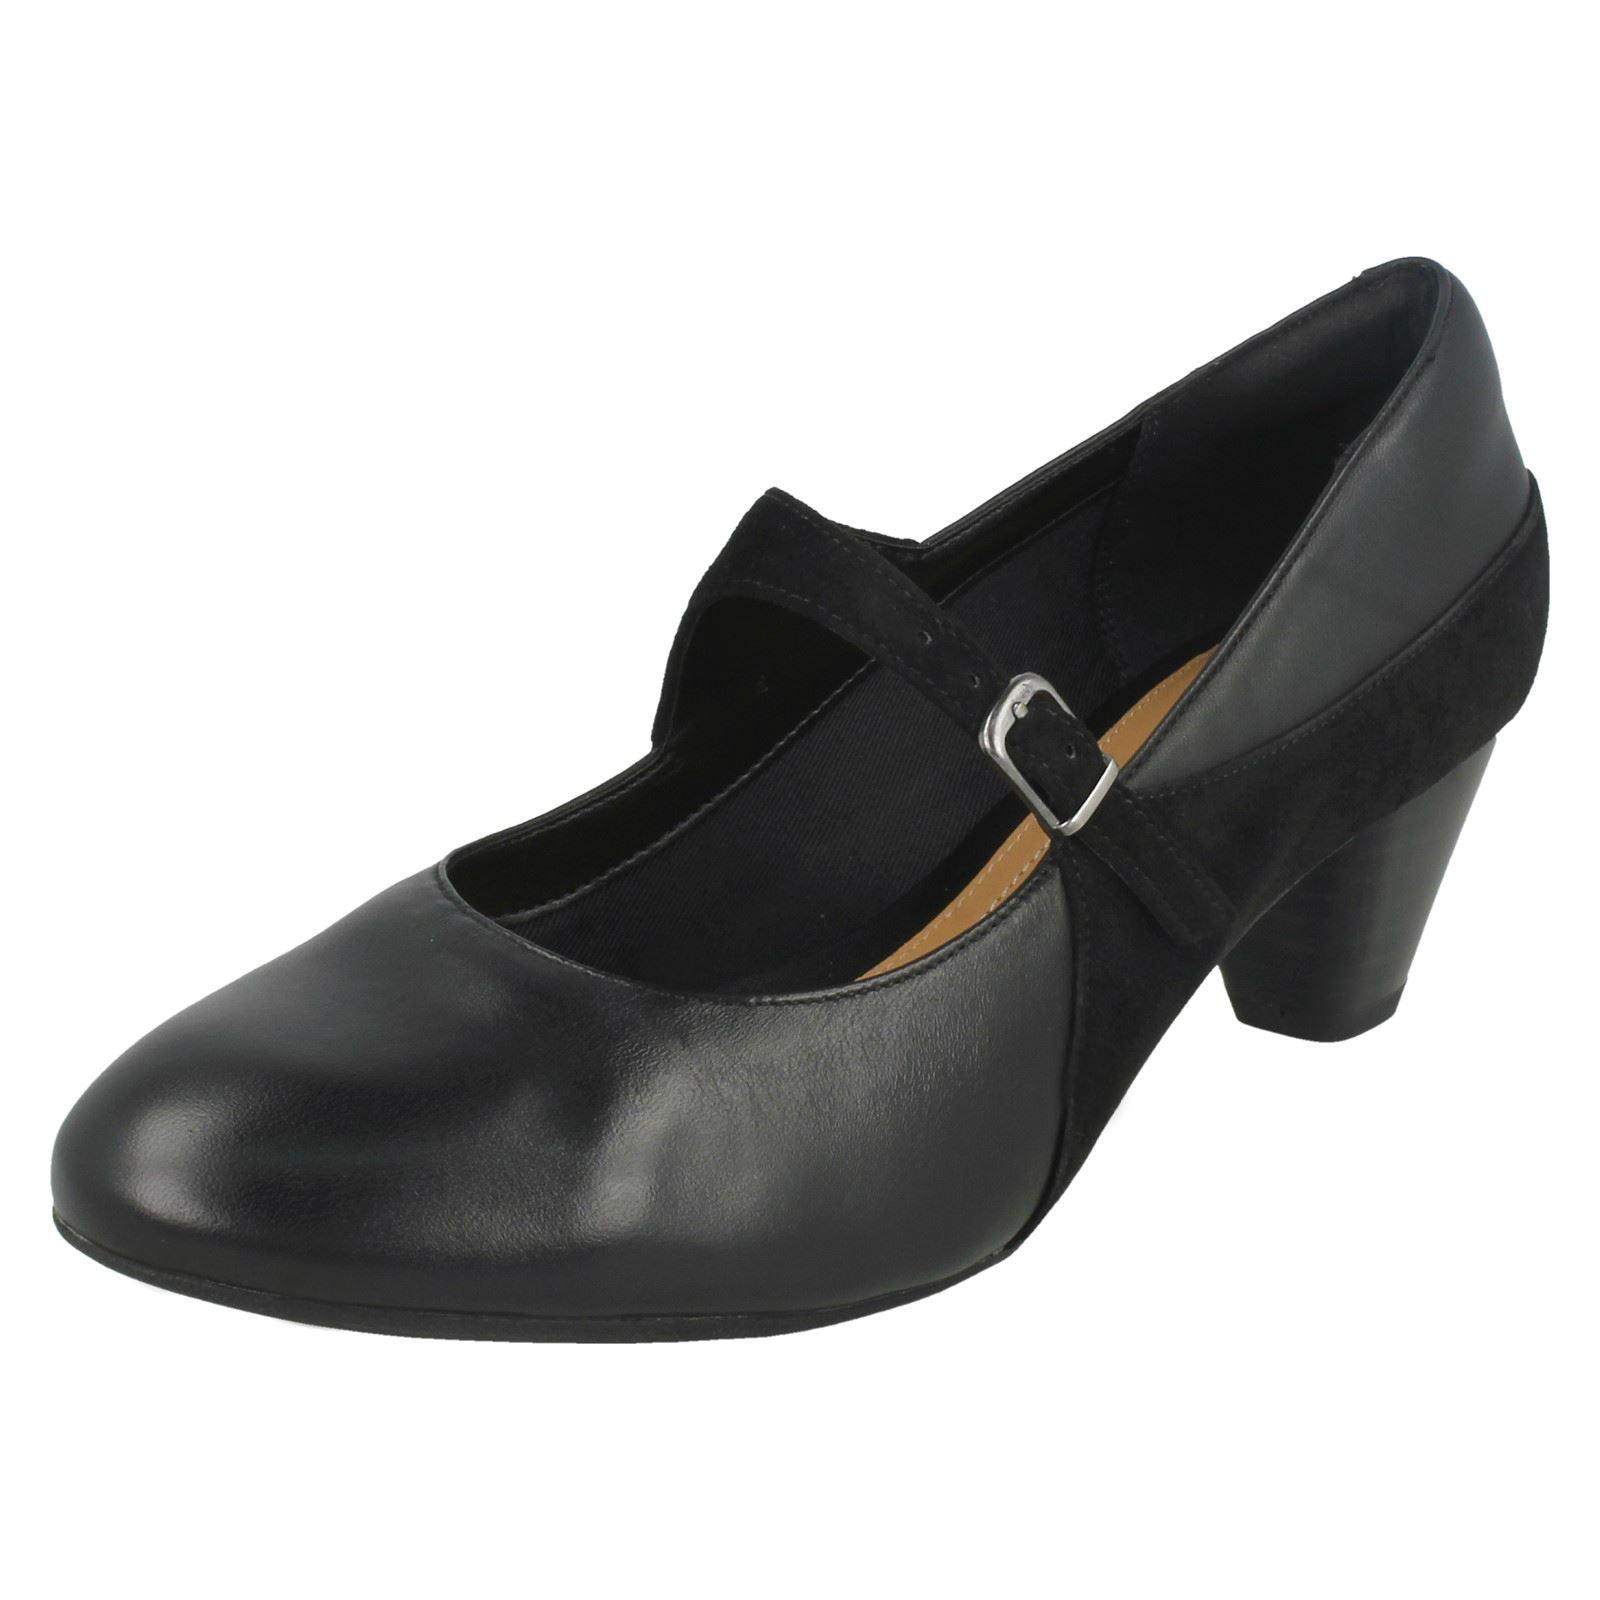 Ladies Clarks Formal Buckle Formal Clarks Court Shoes Denny Bradford 66349b